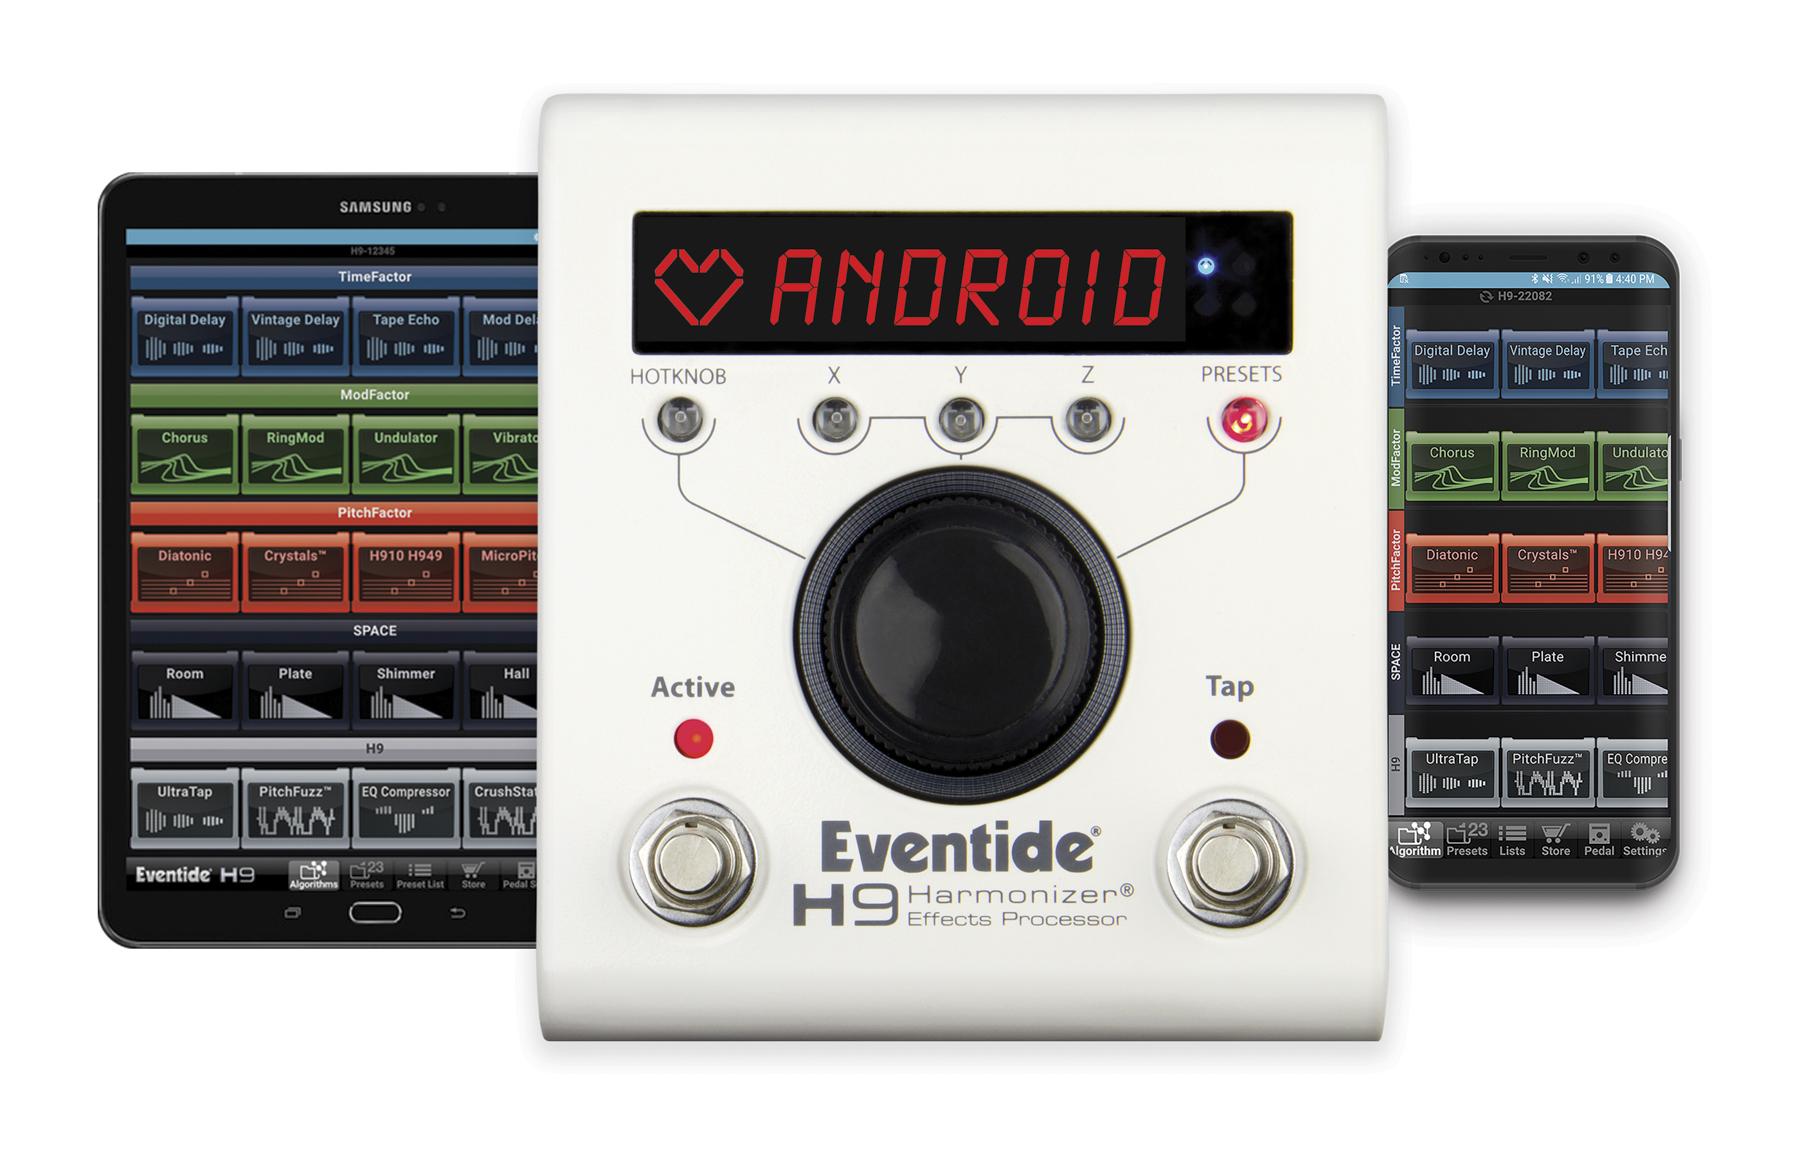 News: Eventide H9 Control App für Andriod verfügbar